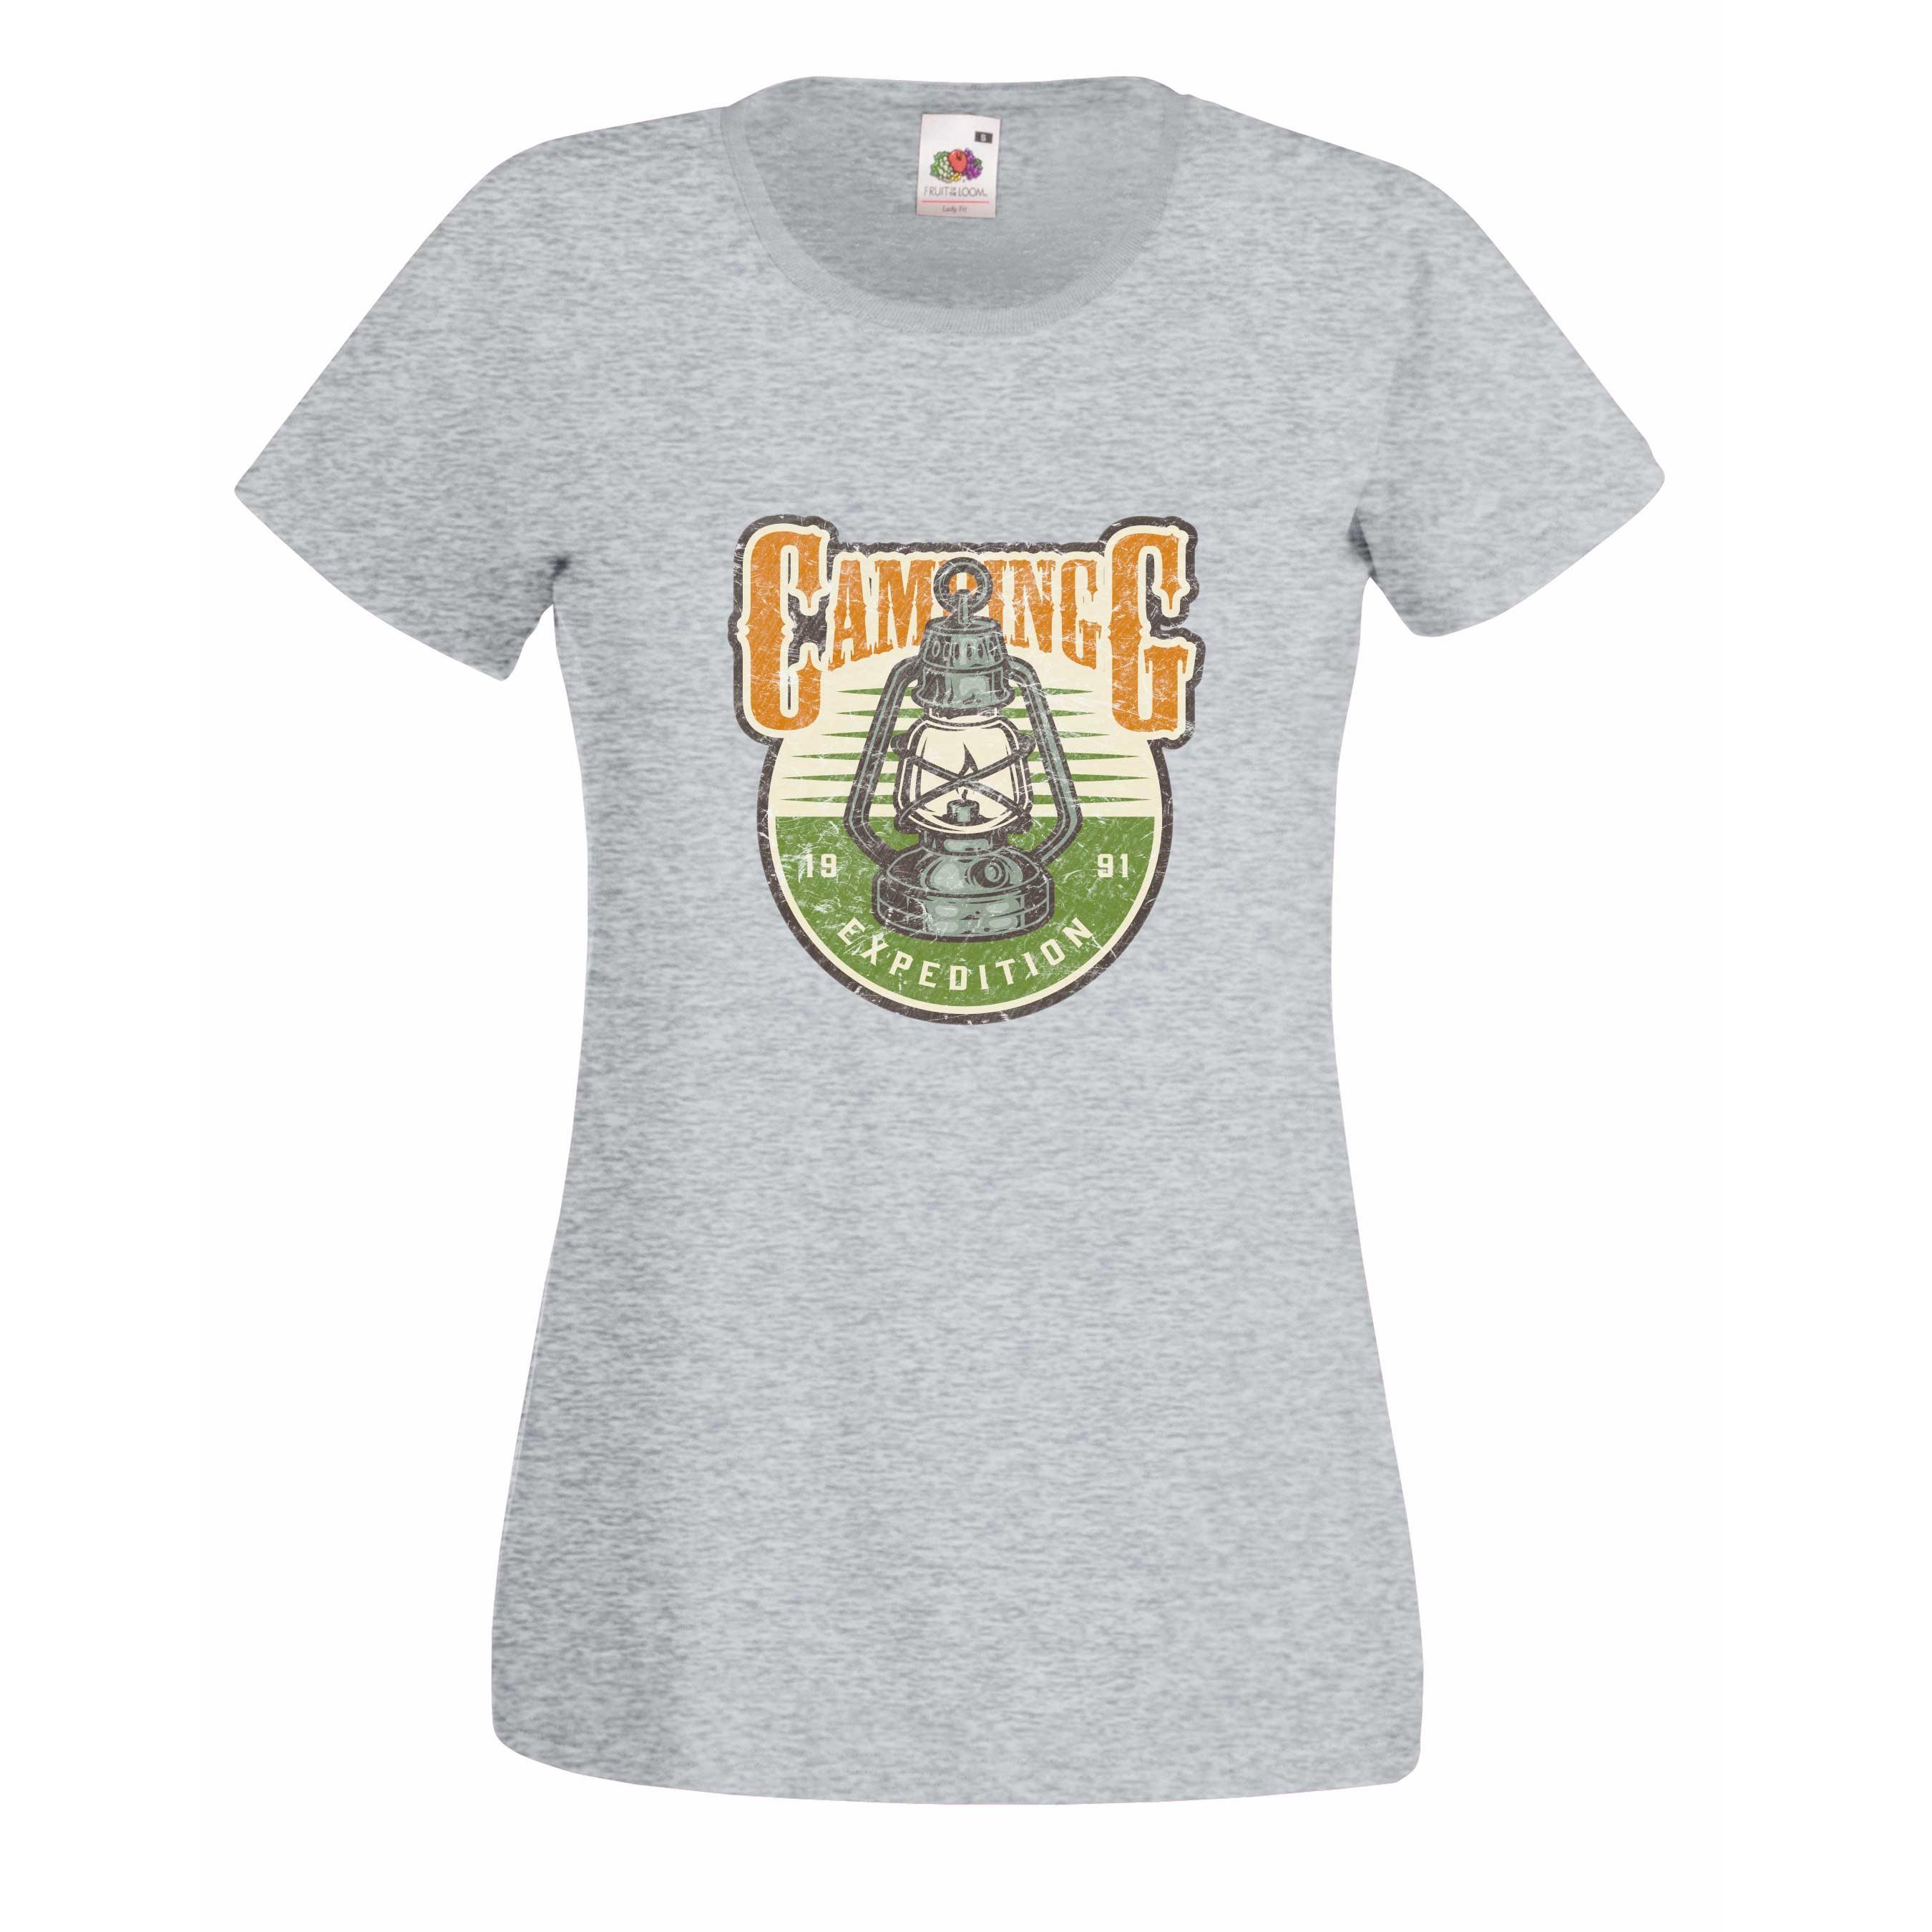 Expedition design for t-shirt, hoodie & sweatshirt